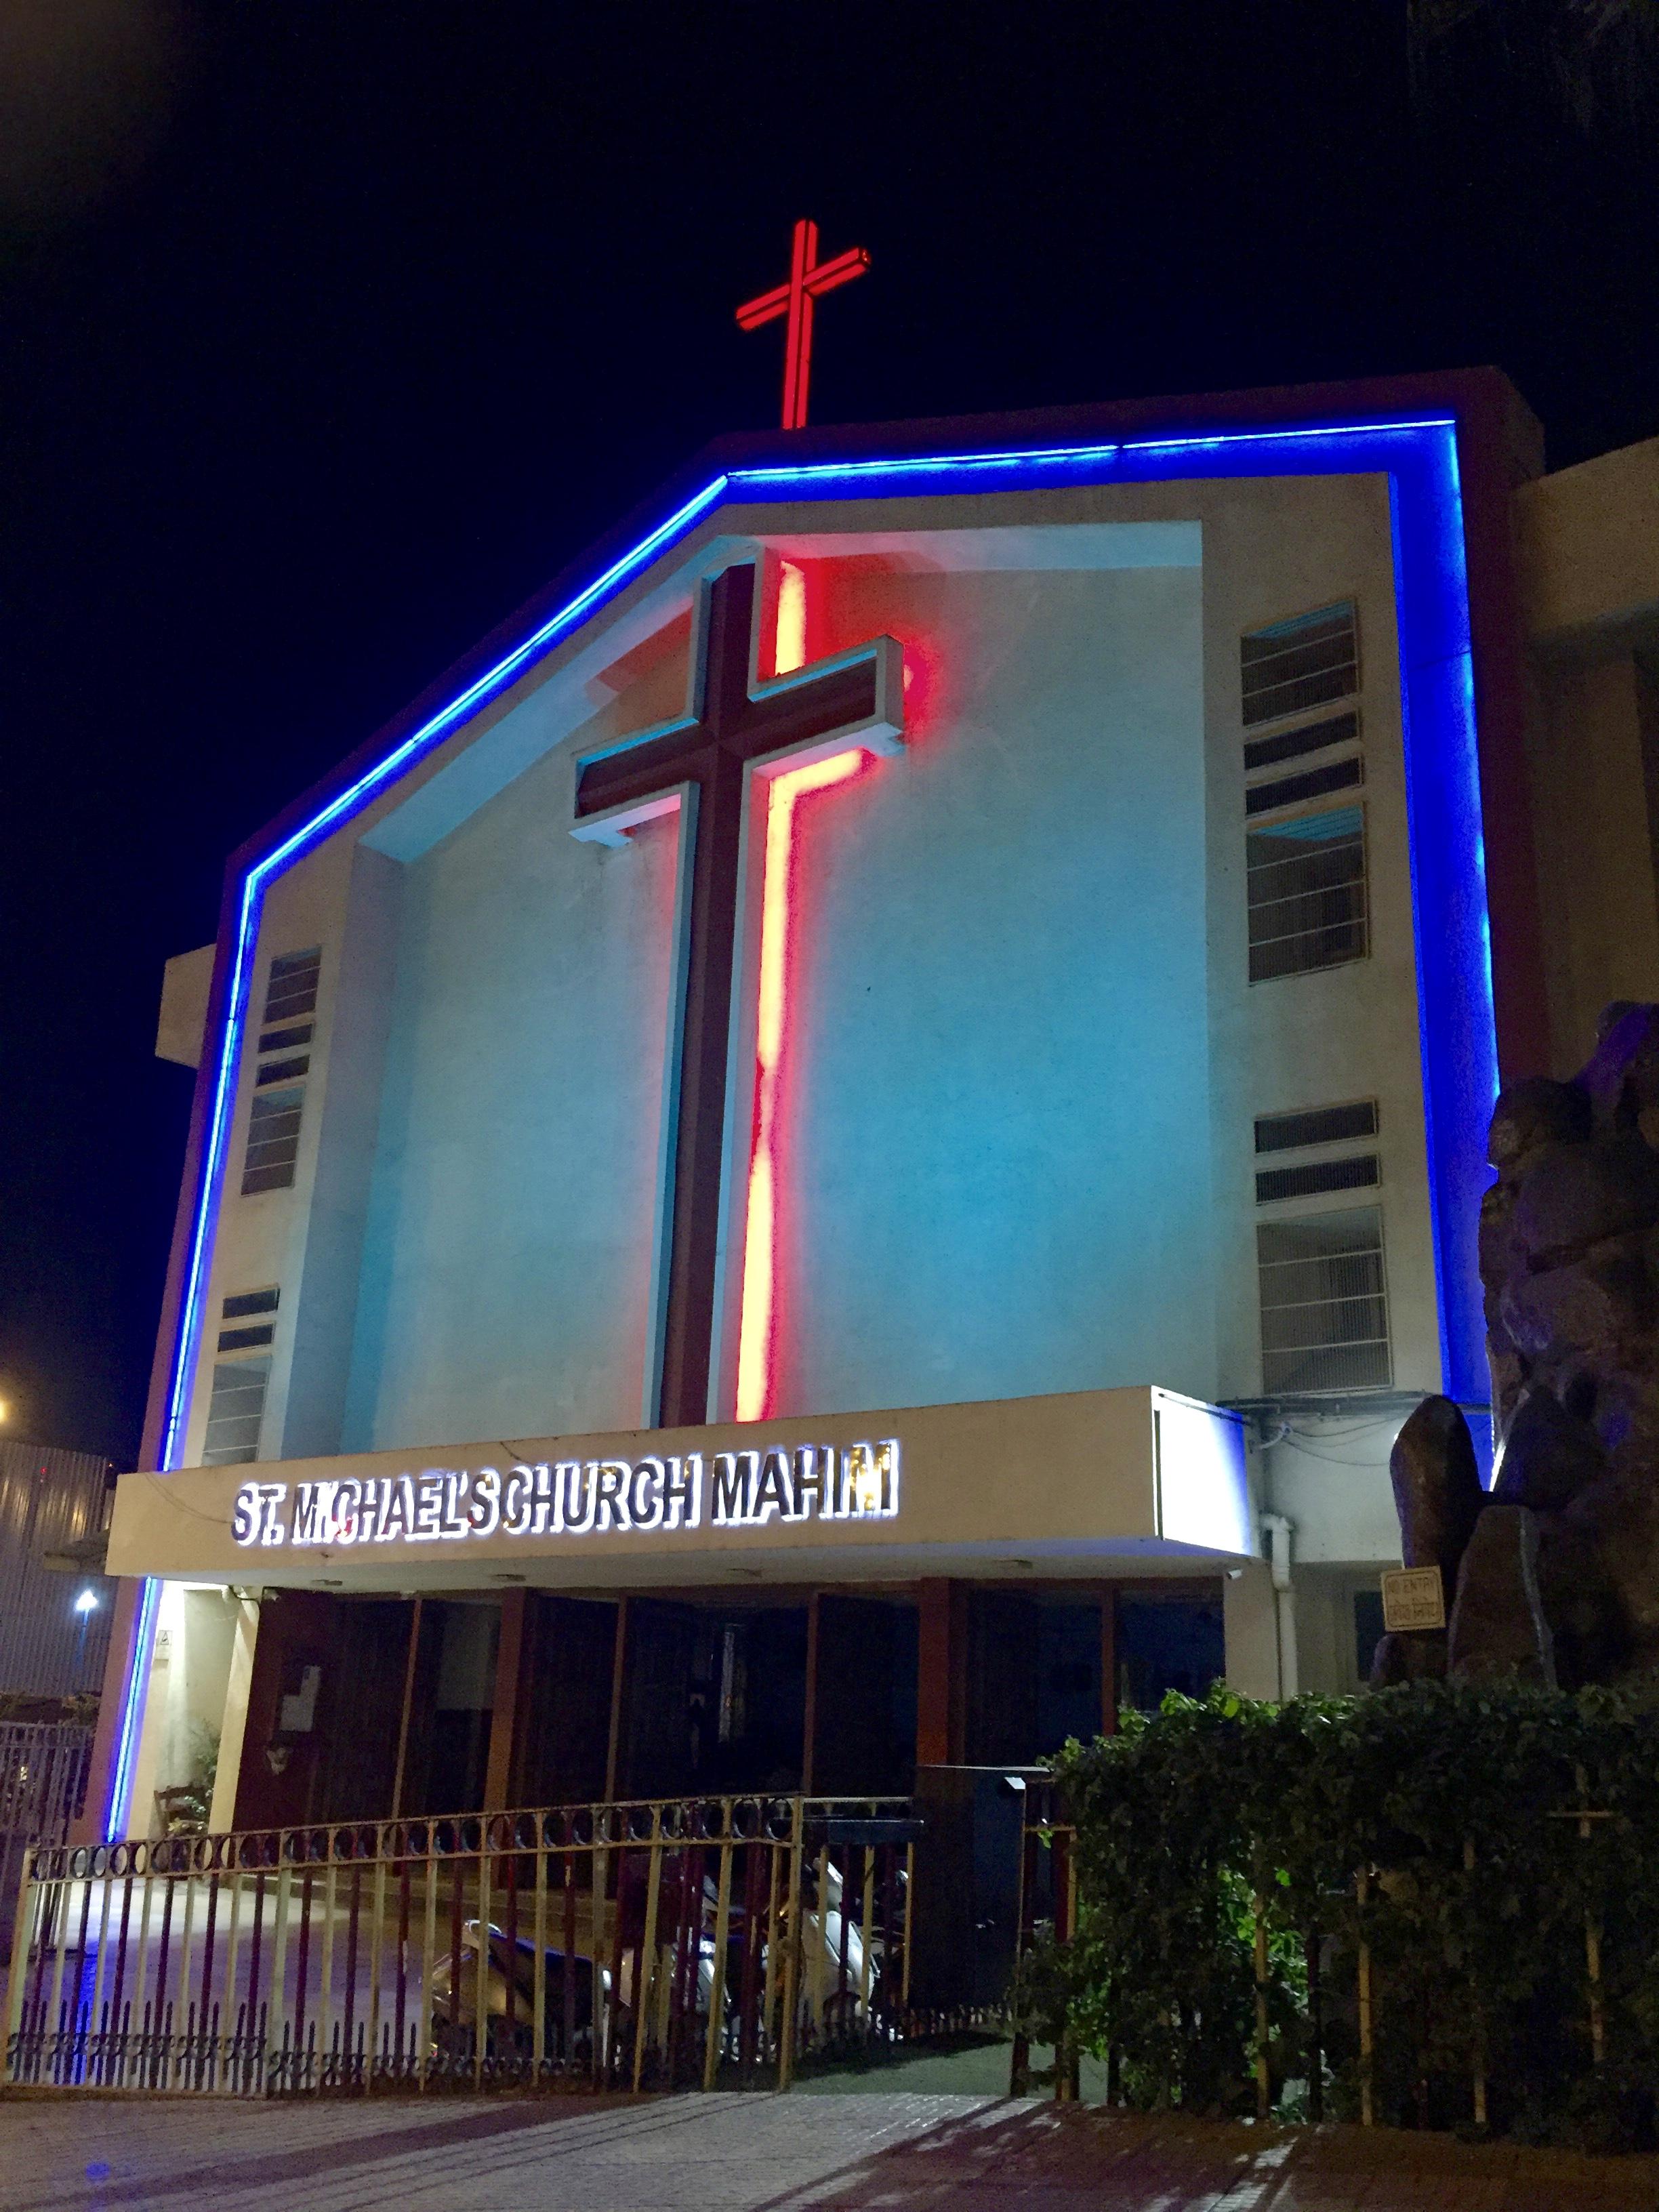 photo relating to Surrender Novena Printable named St. Michaels Church, Mumbai - Wikipedia